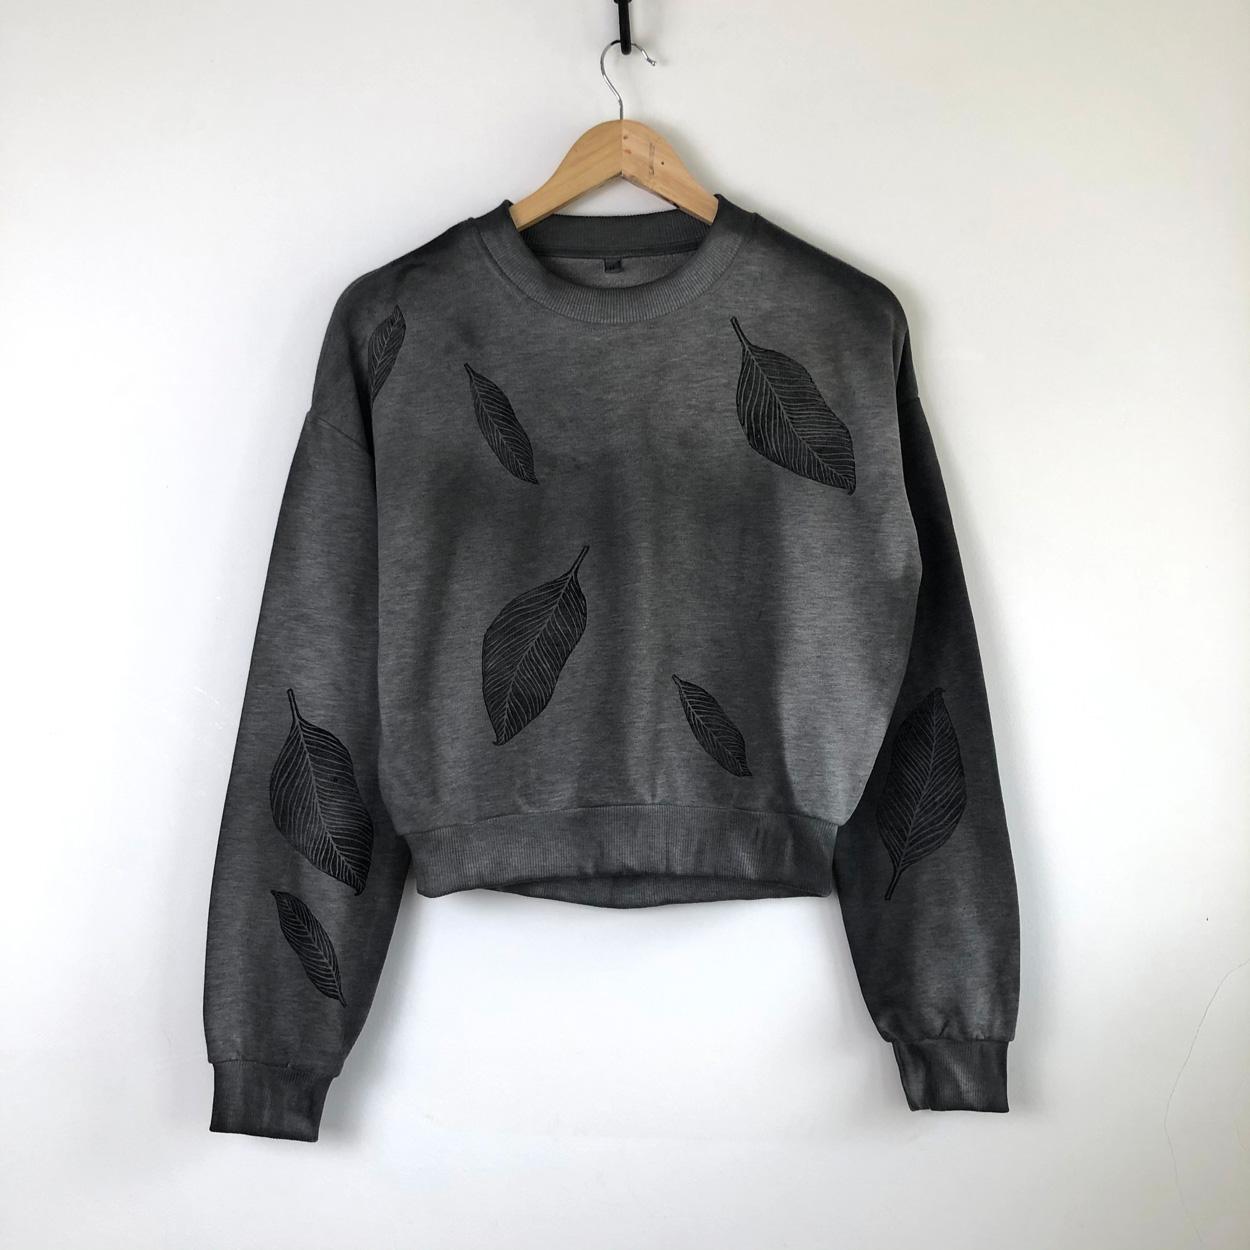 Cloud-Forest-Sweater-Still-Video-Thumb-2